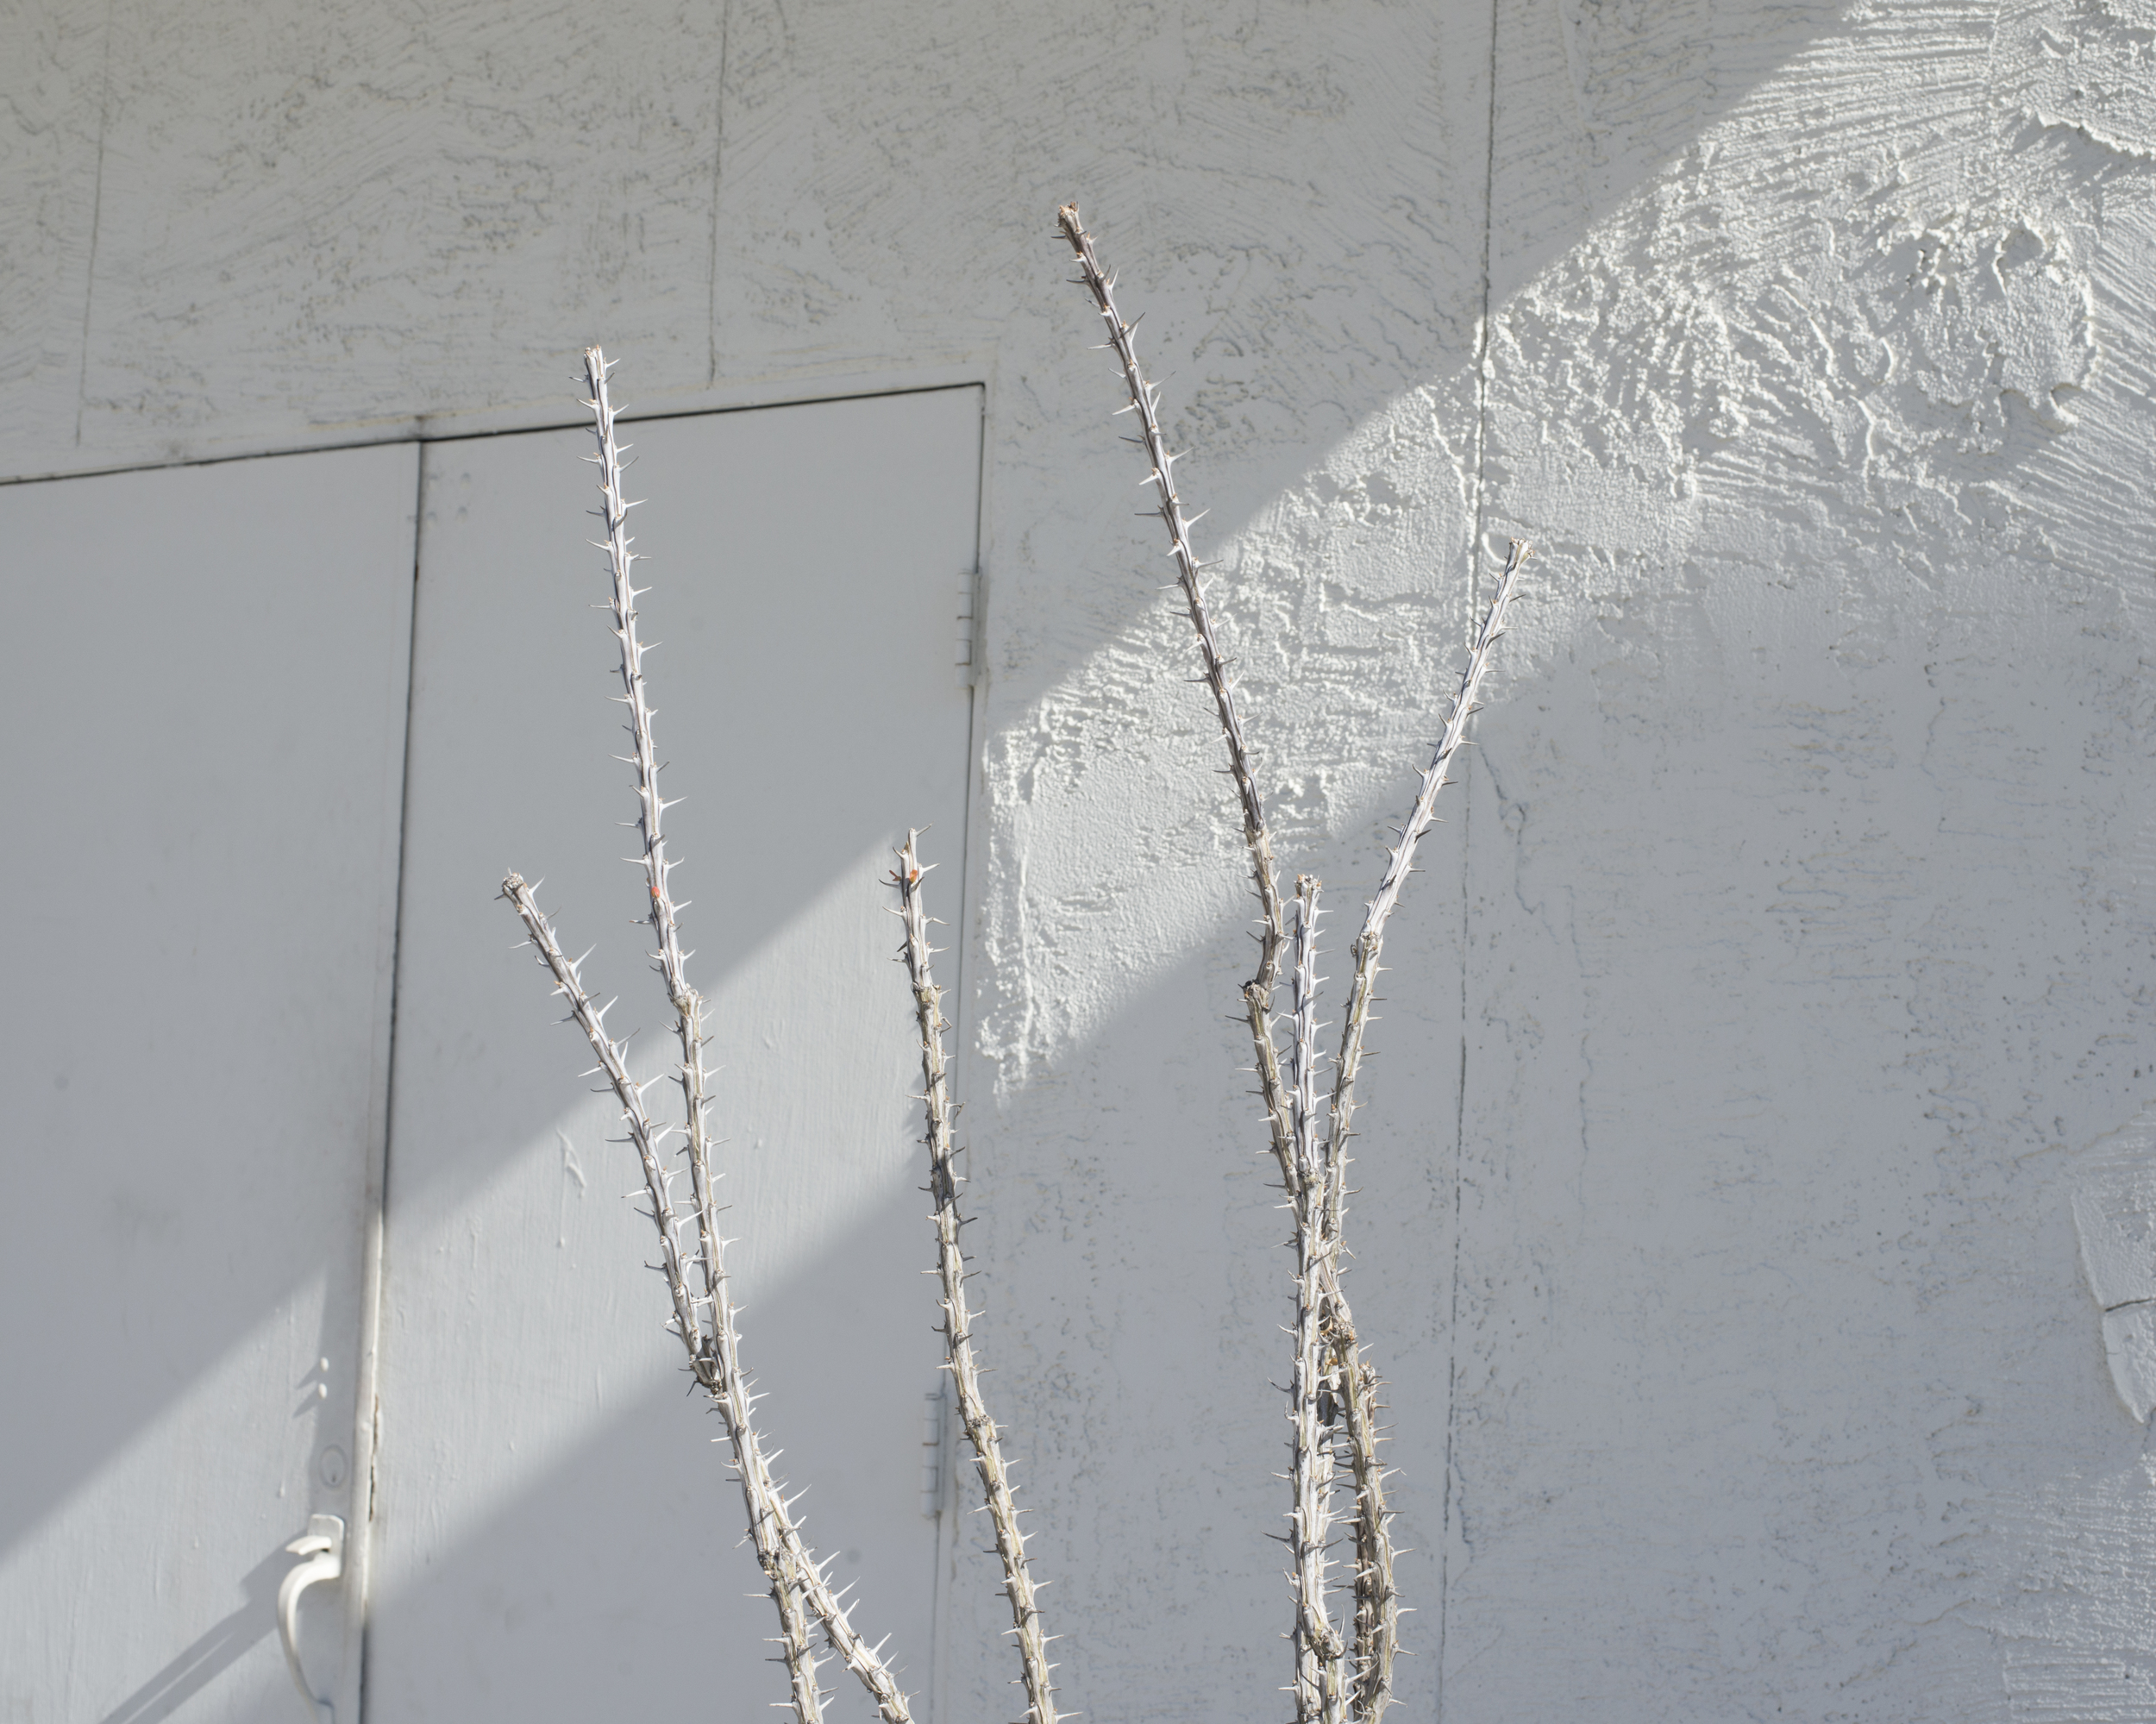 white thorns copy.jpg